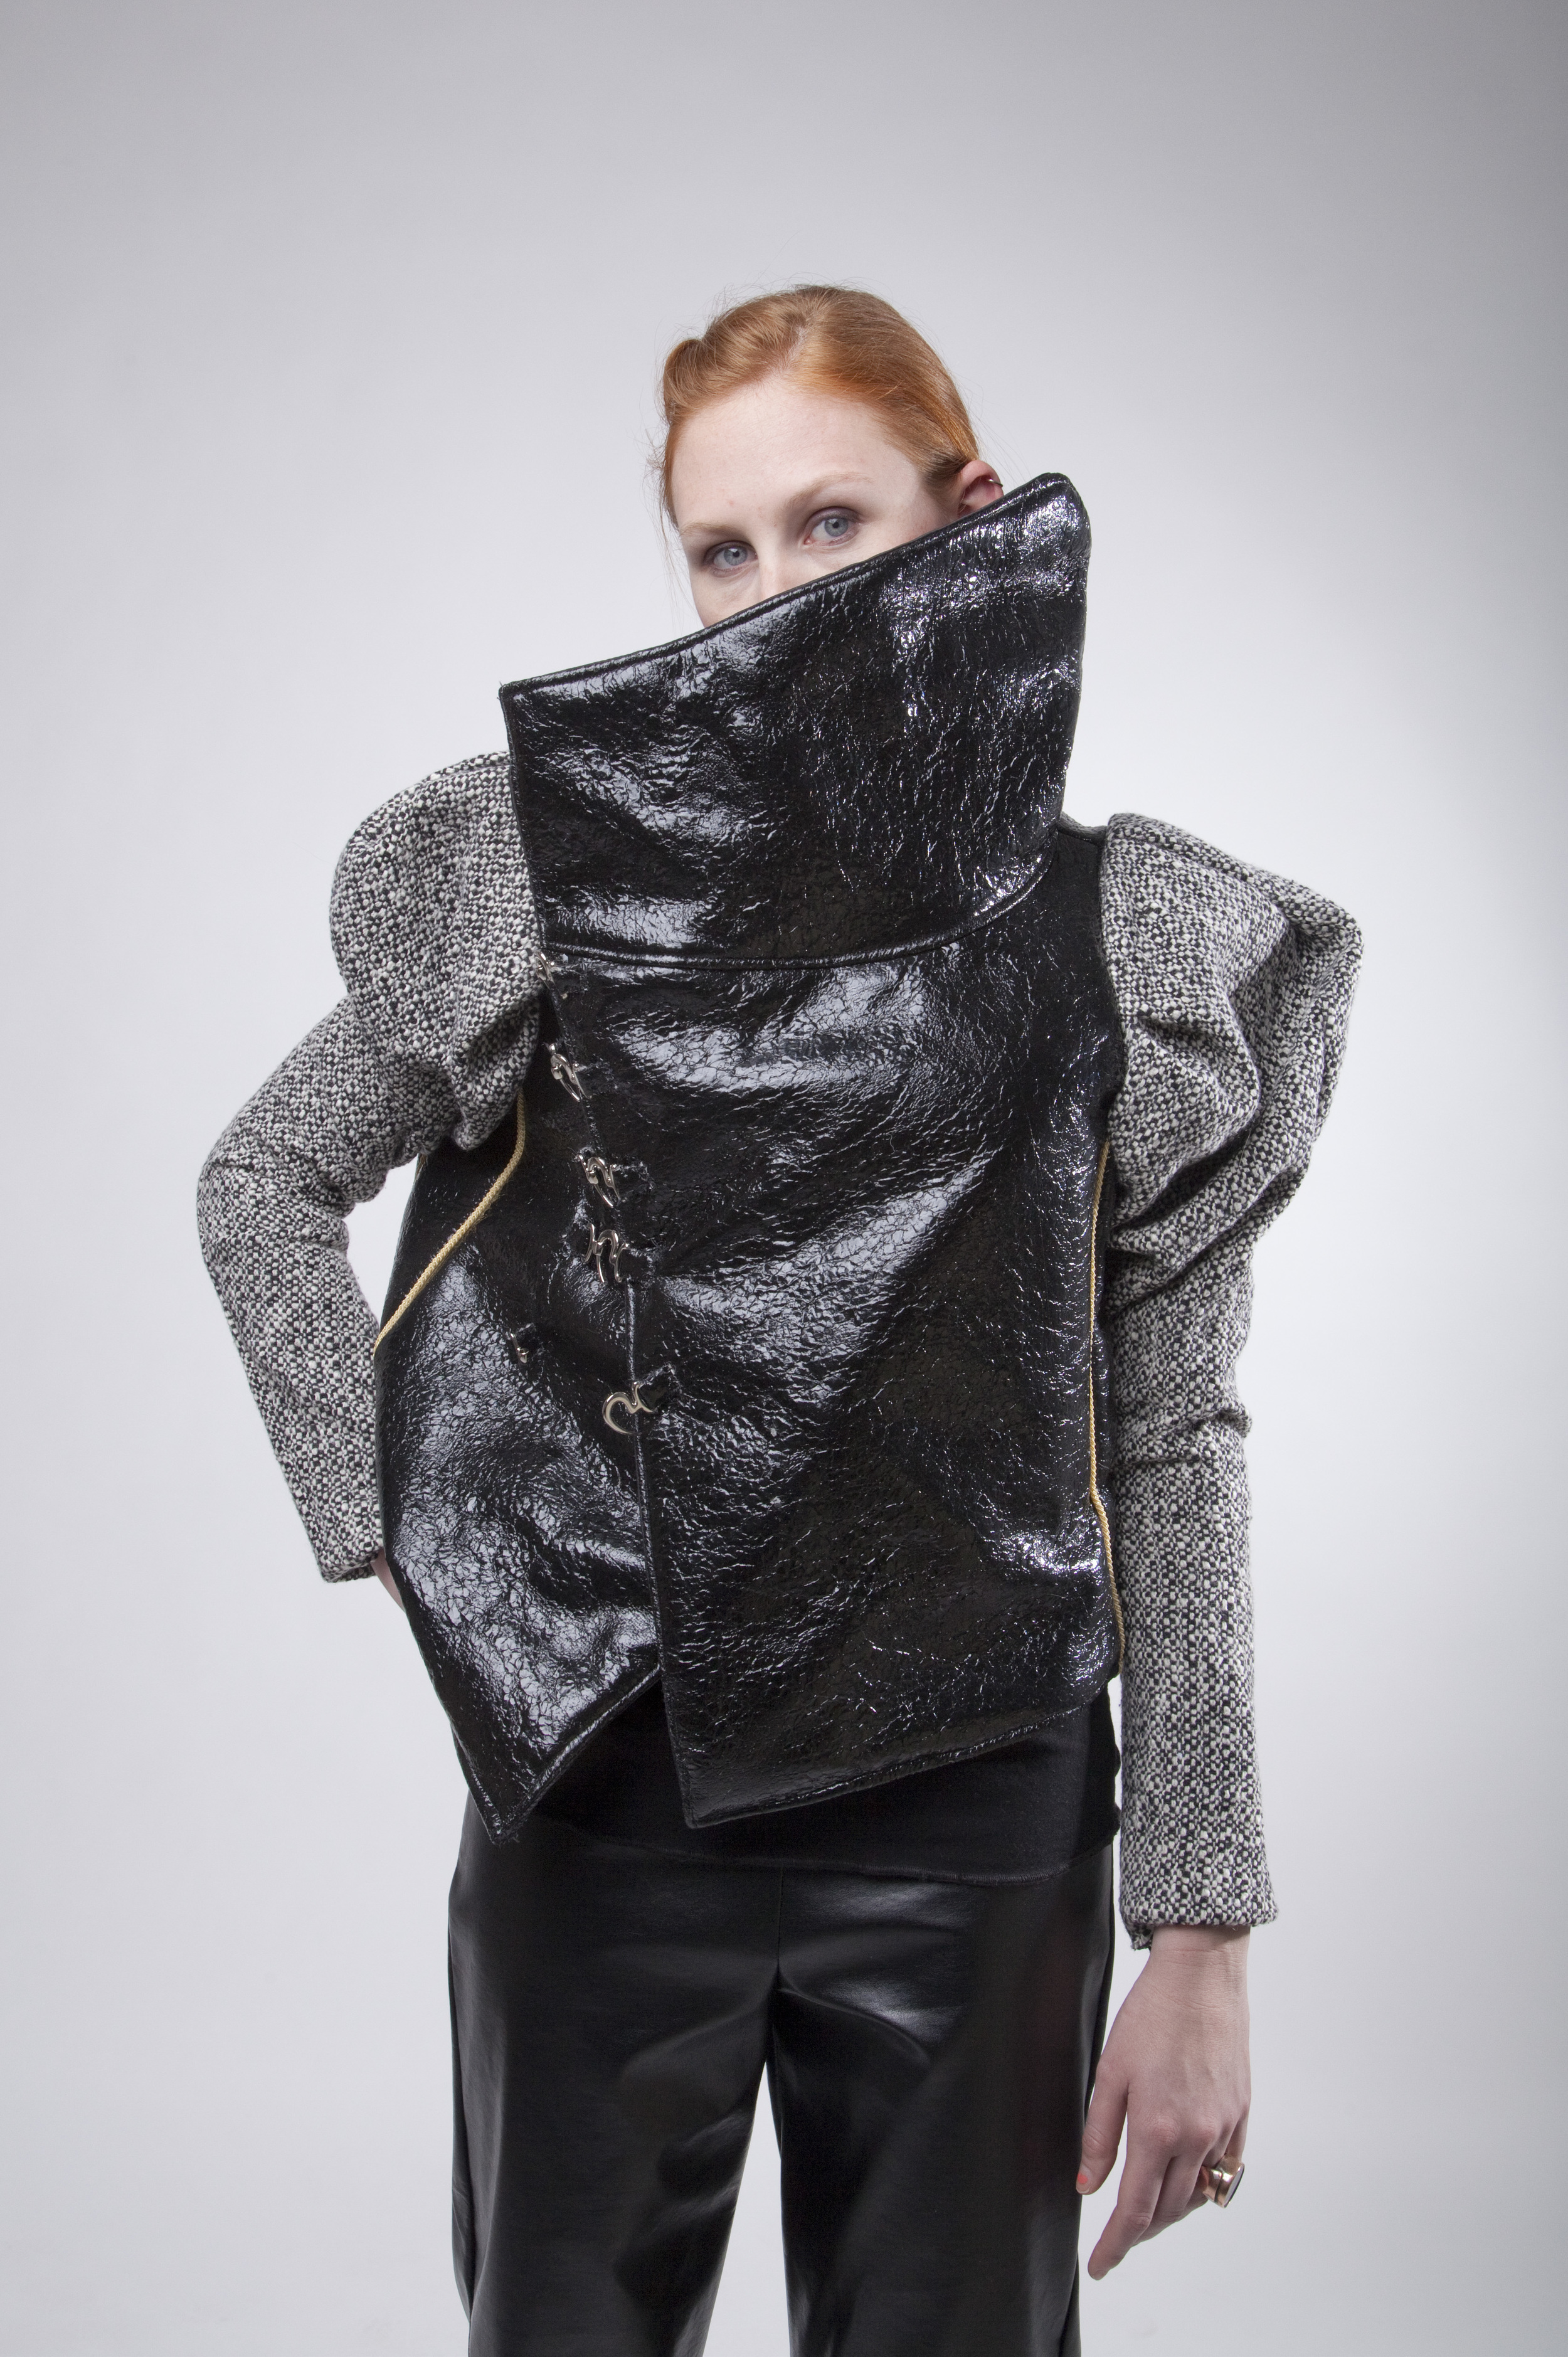 Clothing byRebecca M Sweetbaum